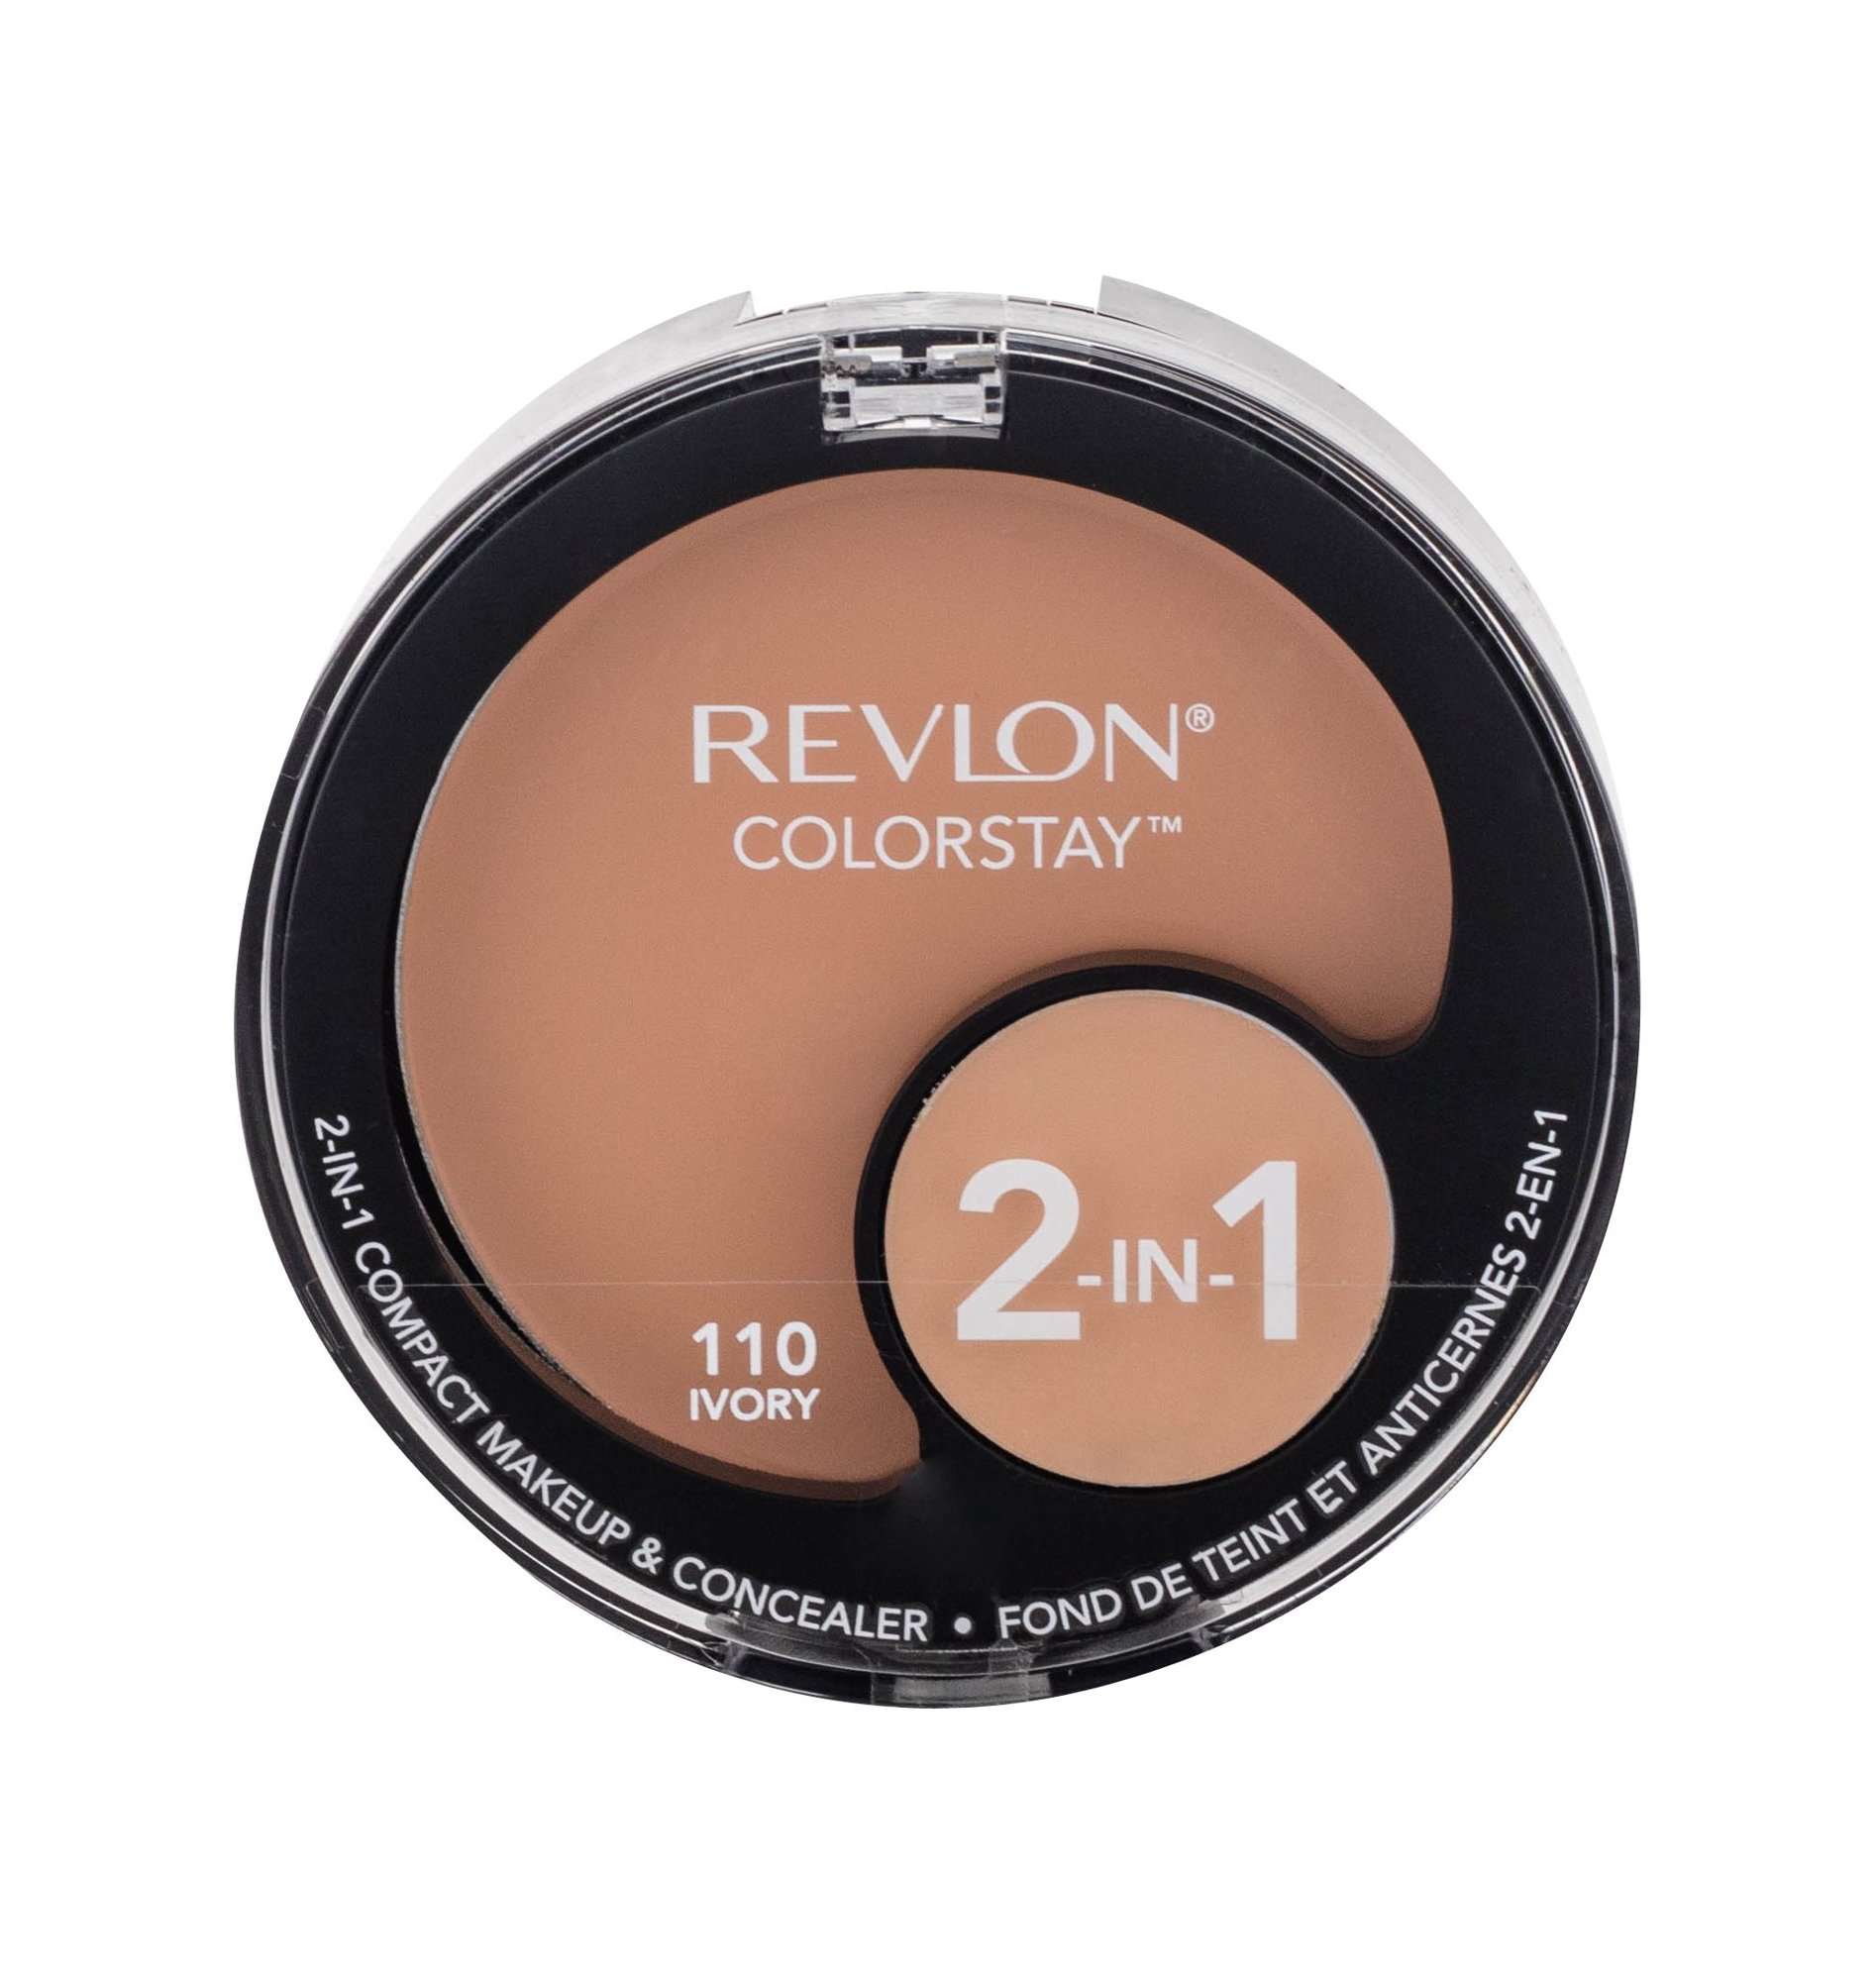 Revlon Colorstay Makeup 12,3ml 110 Ivory